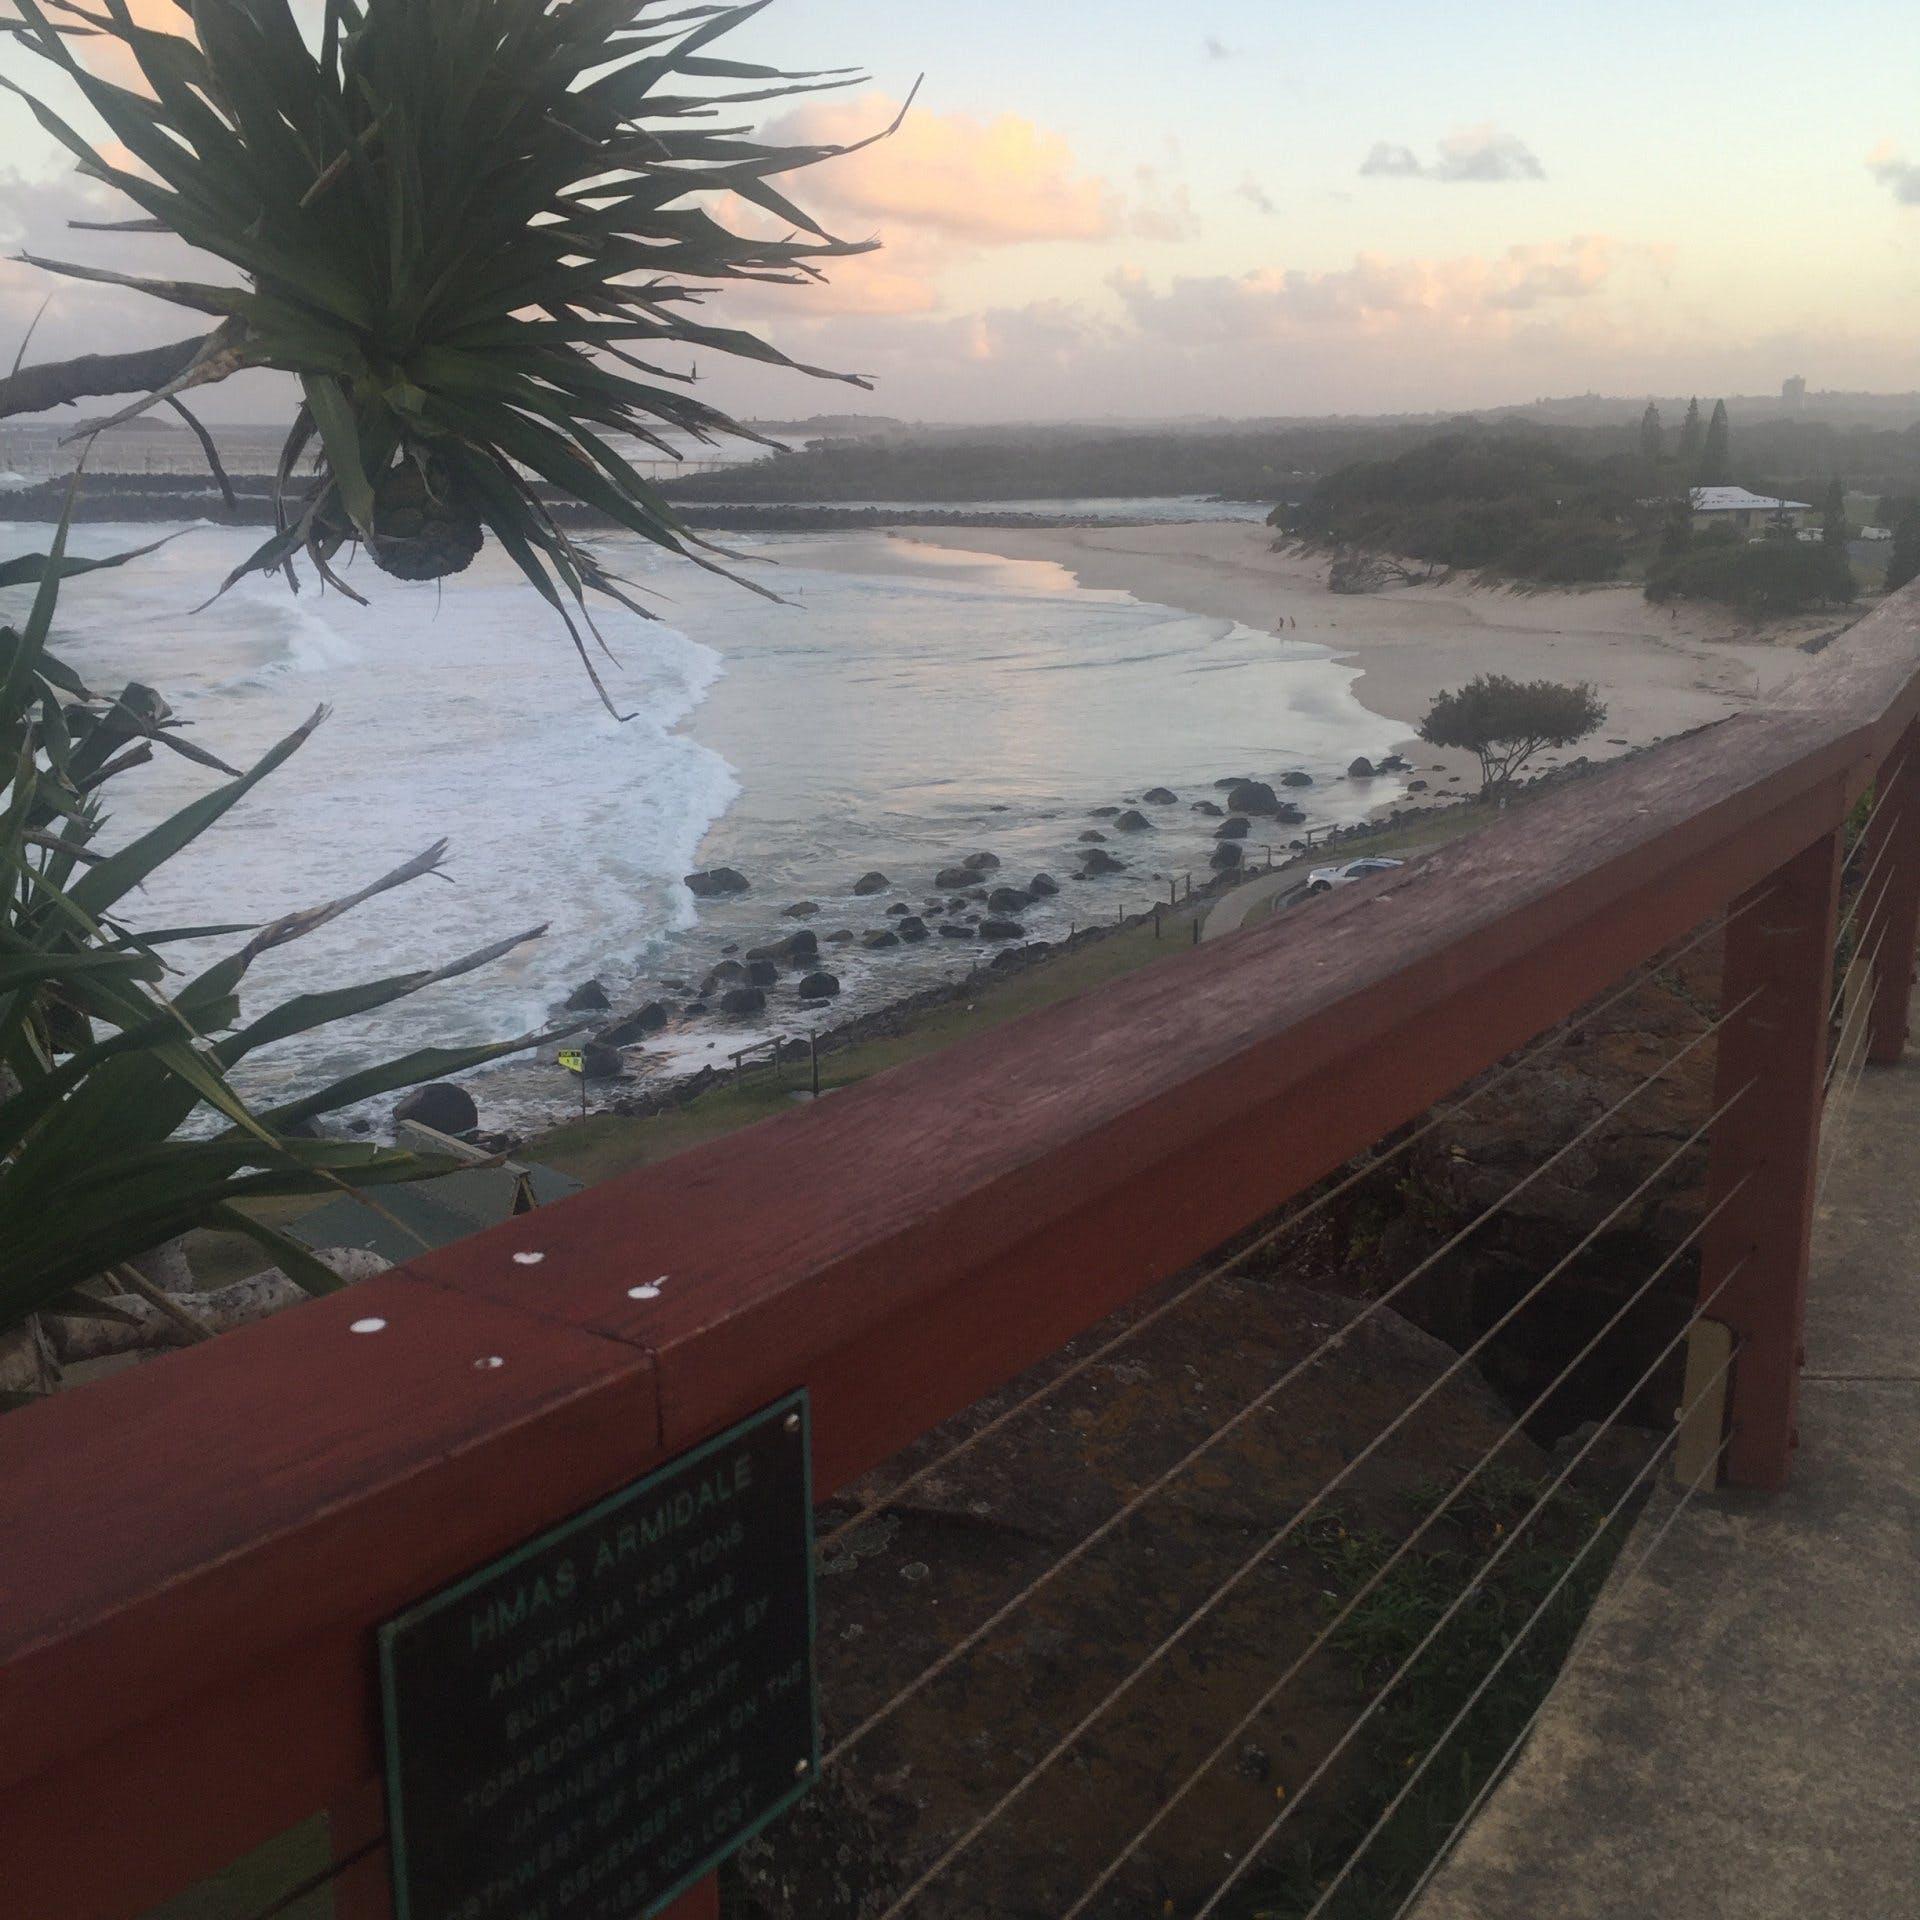 Tweed Heads - Views from Point Danger of Duranbah Beach